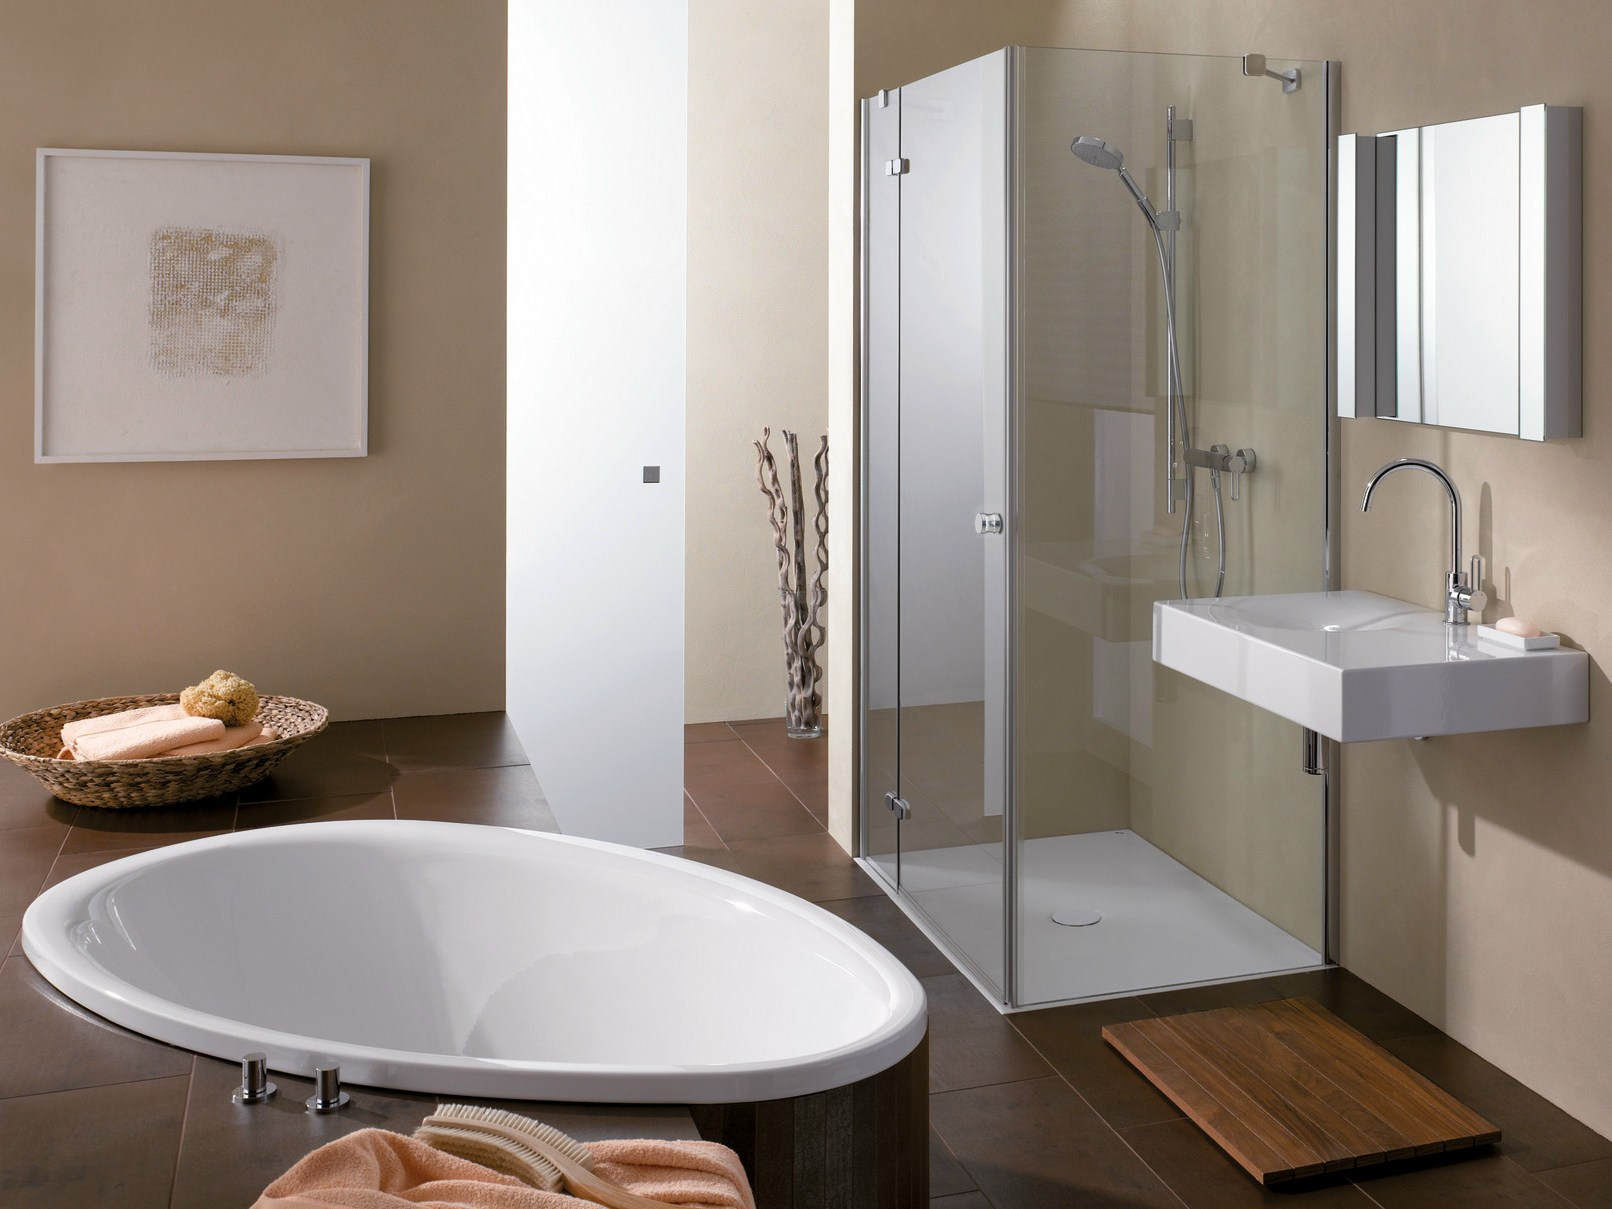 baignoire sabot sealskin get wet optimo baignoire assise xcm blanc with baignoire sabot cool. Black Bedroom Furniture Sets. Home Design Ideas